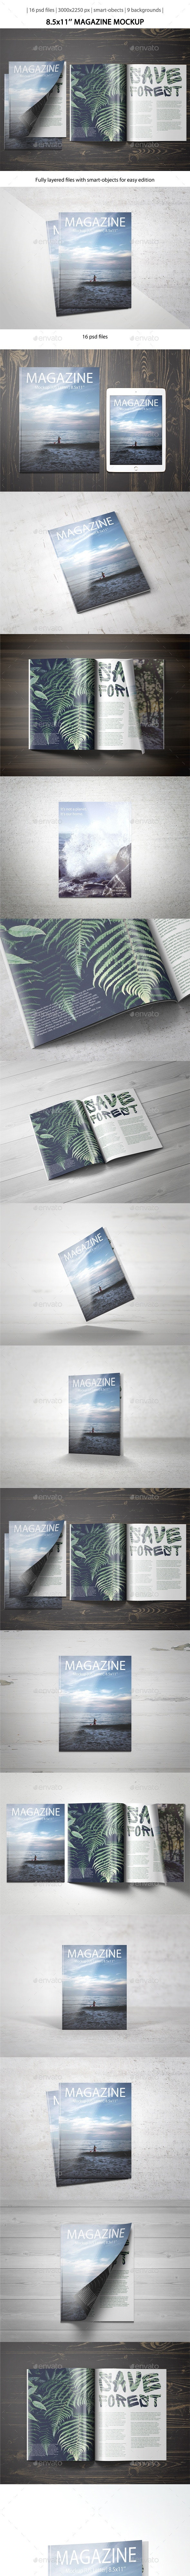 8.5x11 Magazine Mockup - Magazines Print